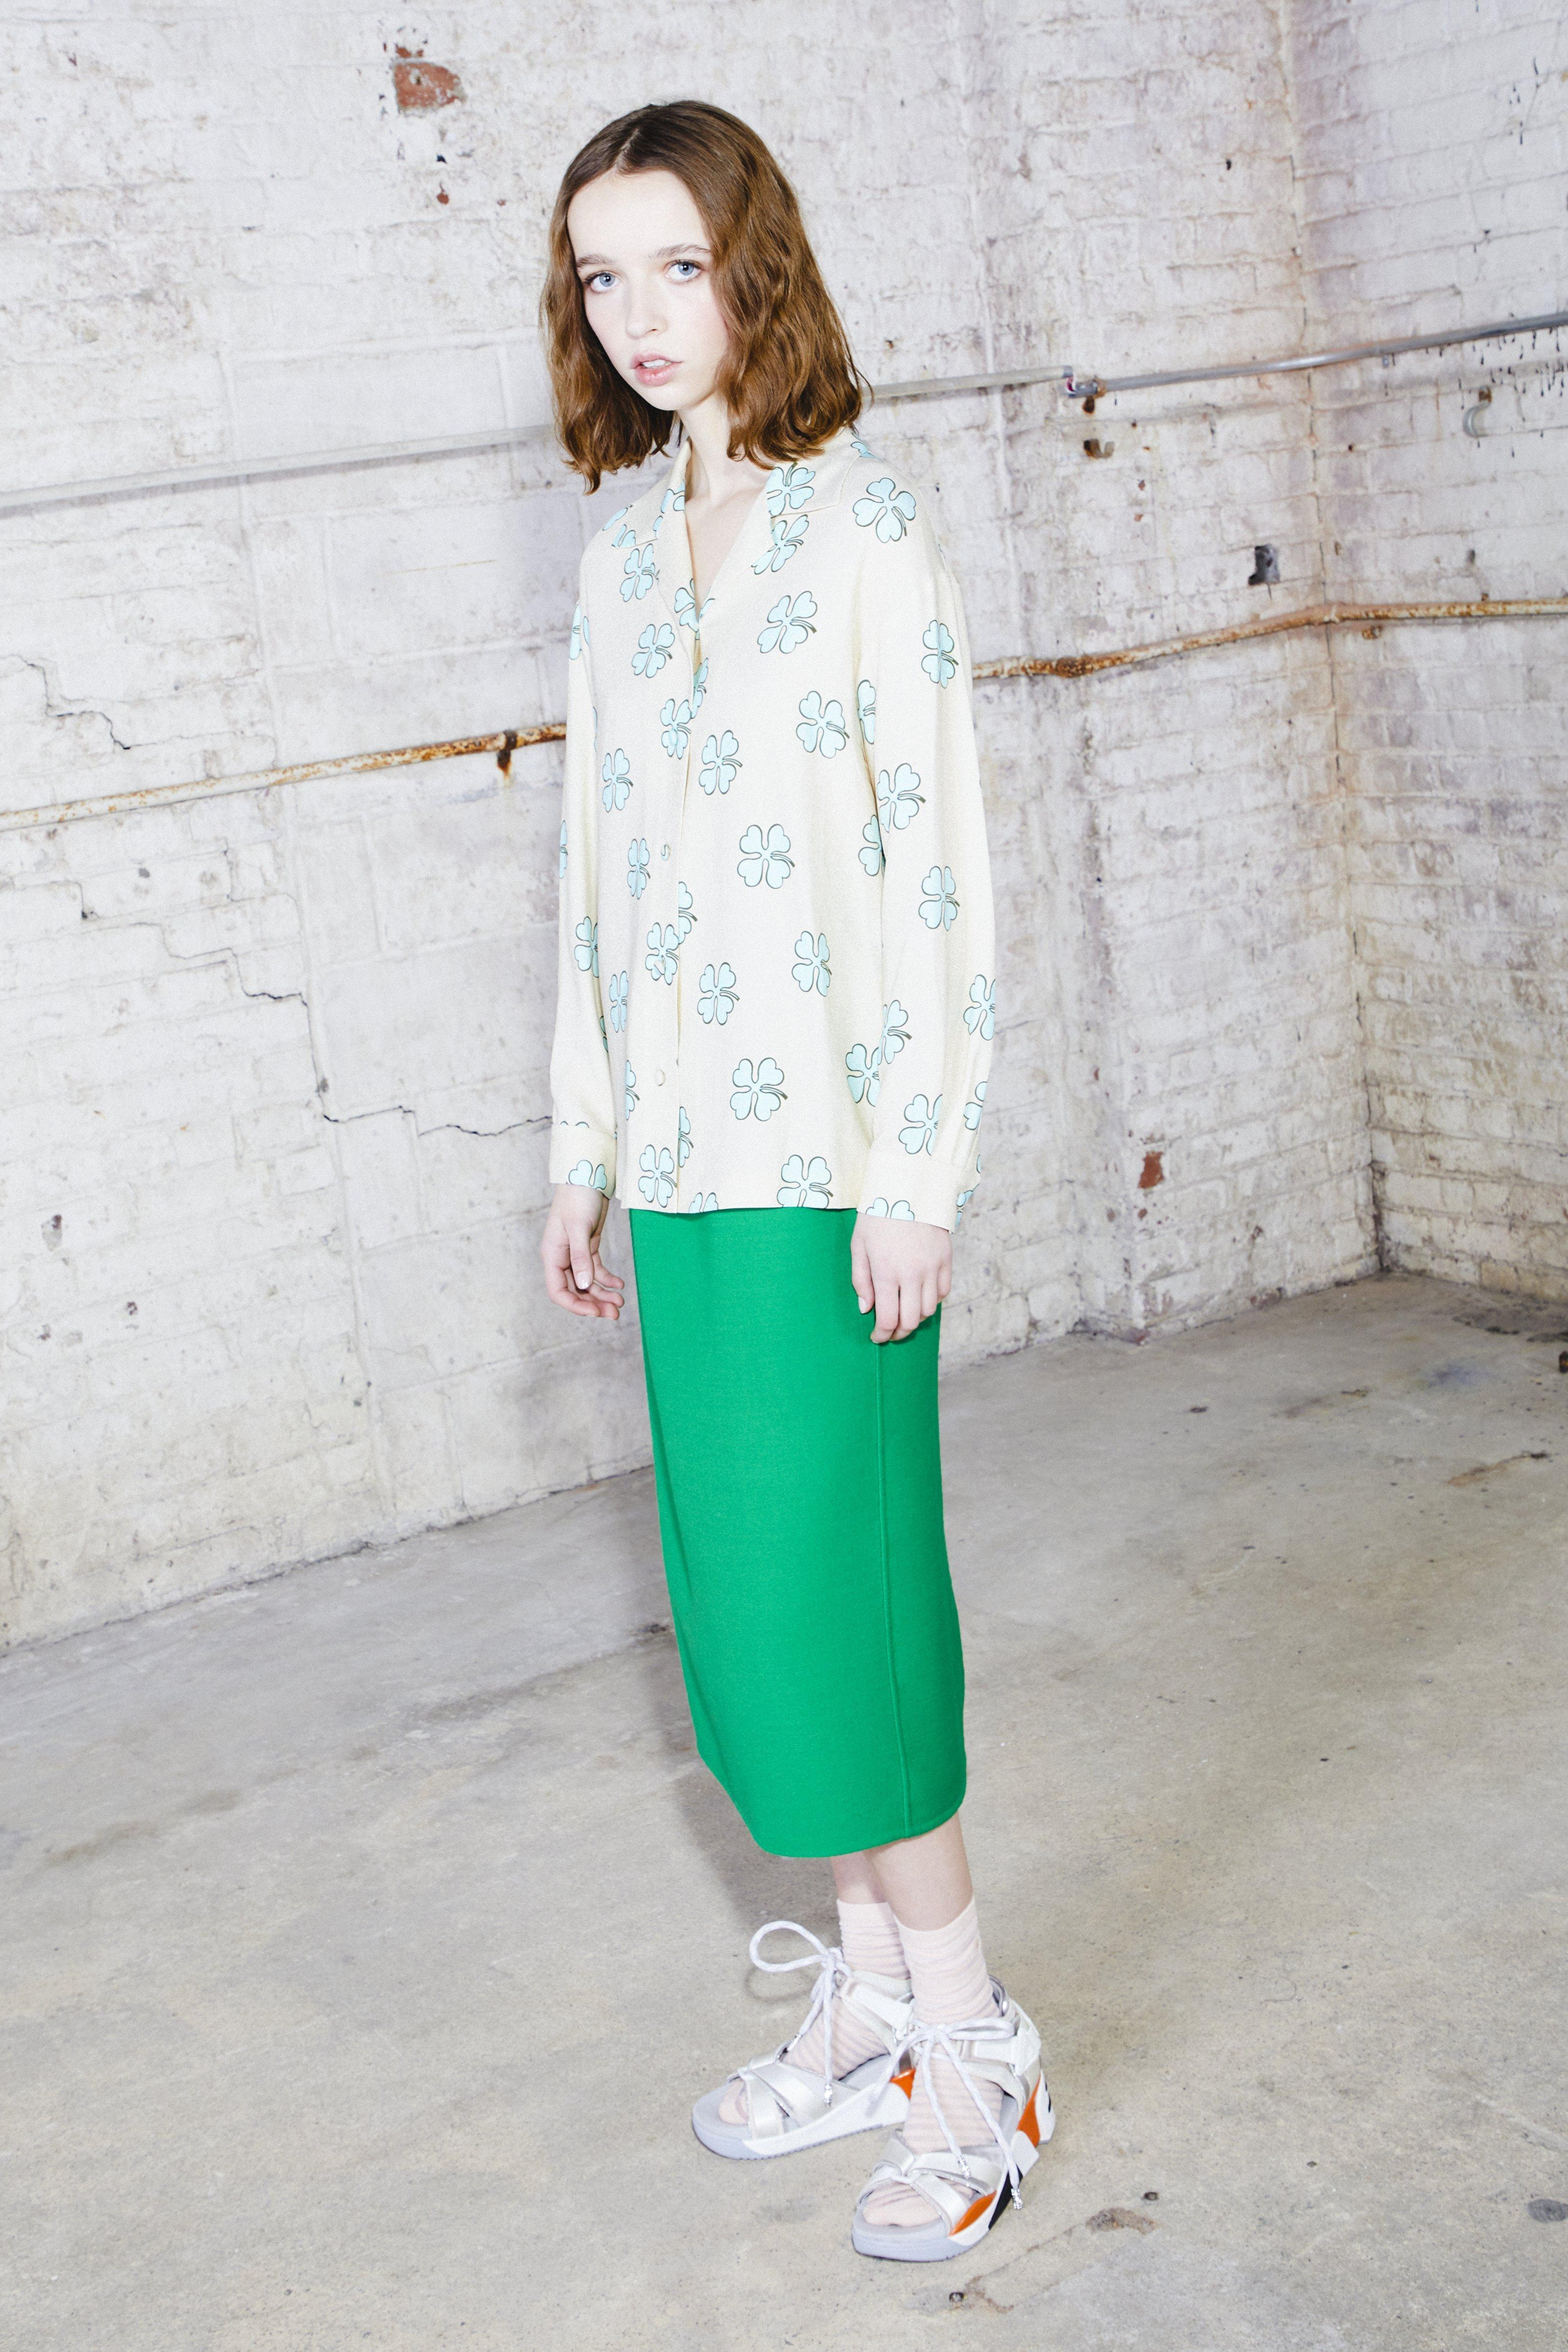 Marc Jacobs Elastic Waist Pencil Skirt In Green